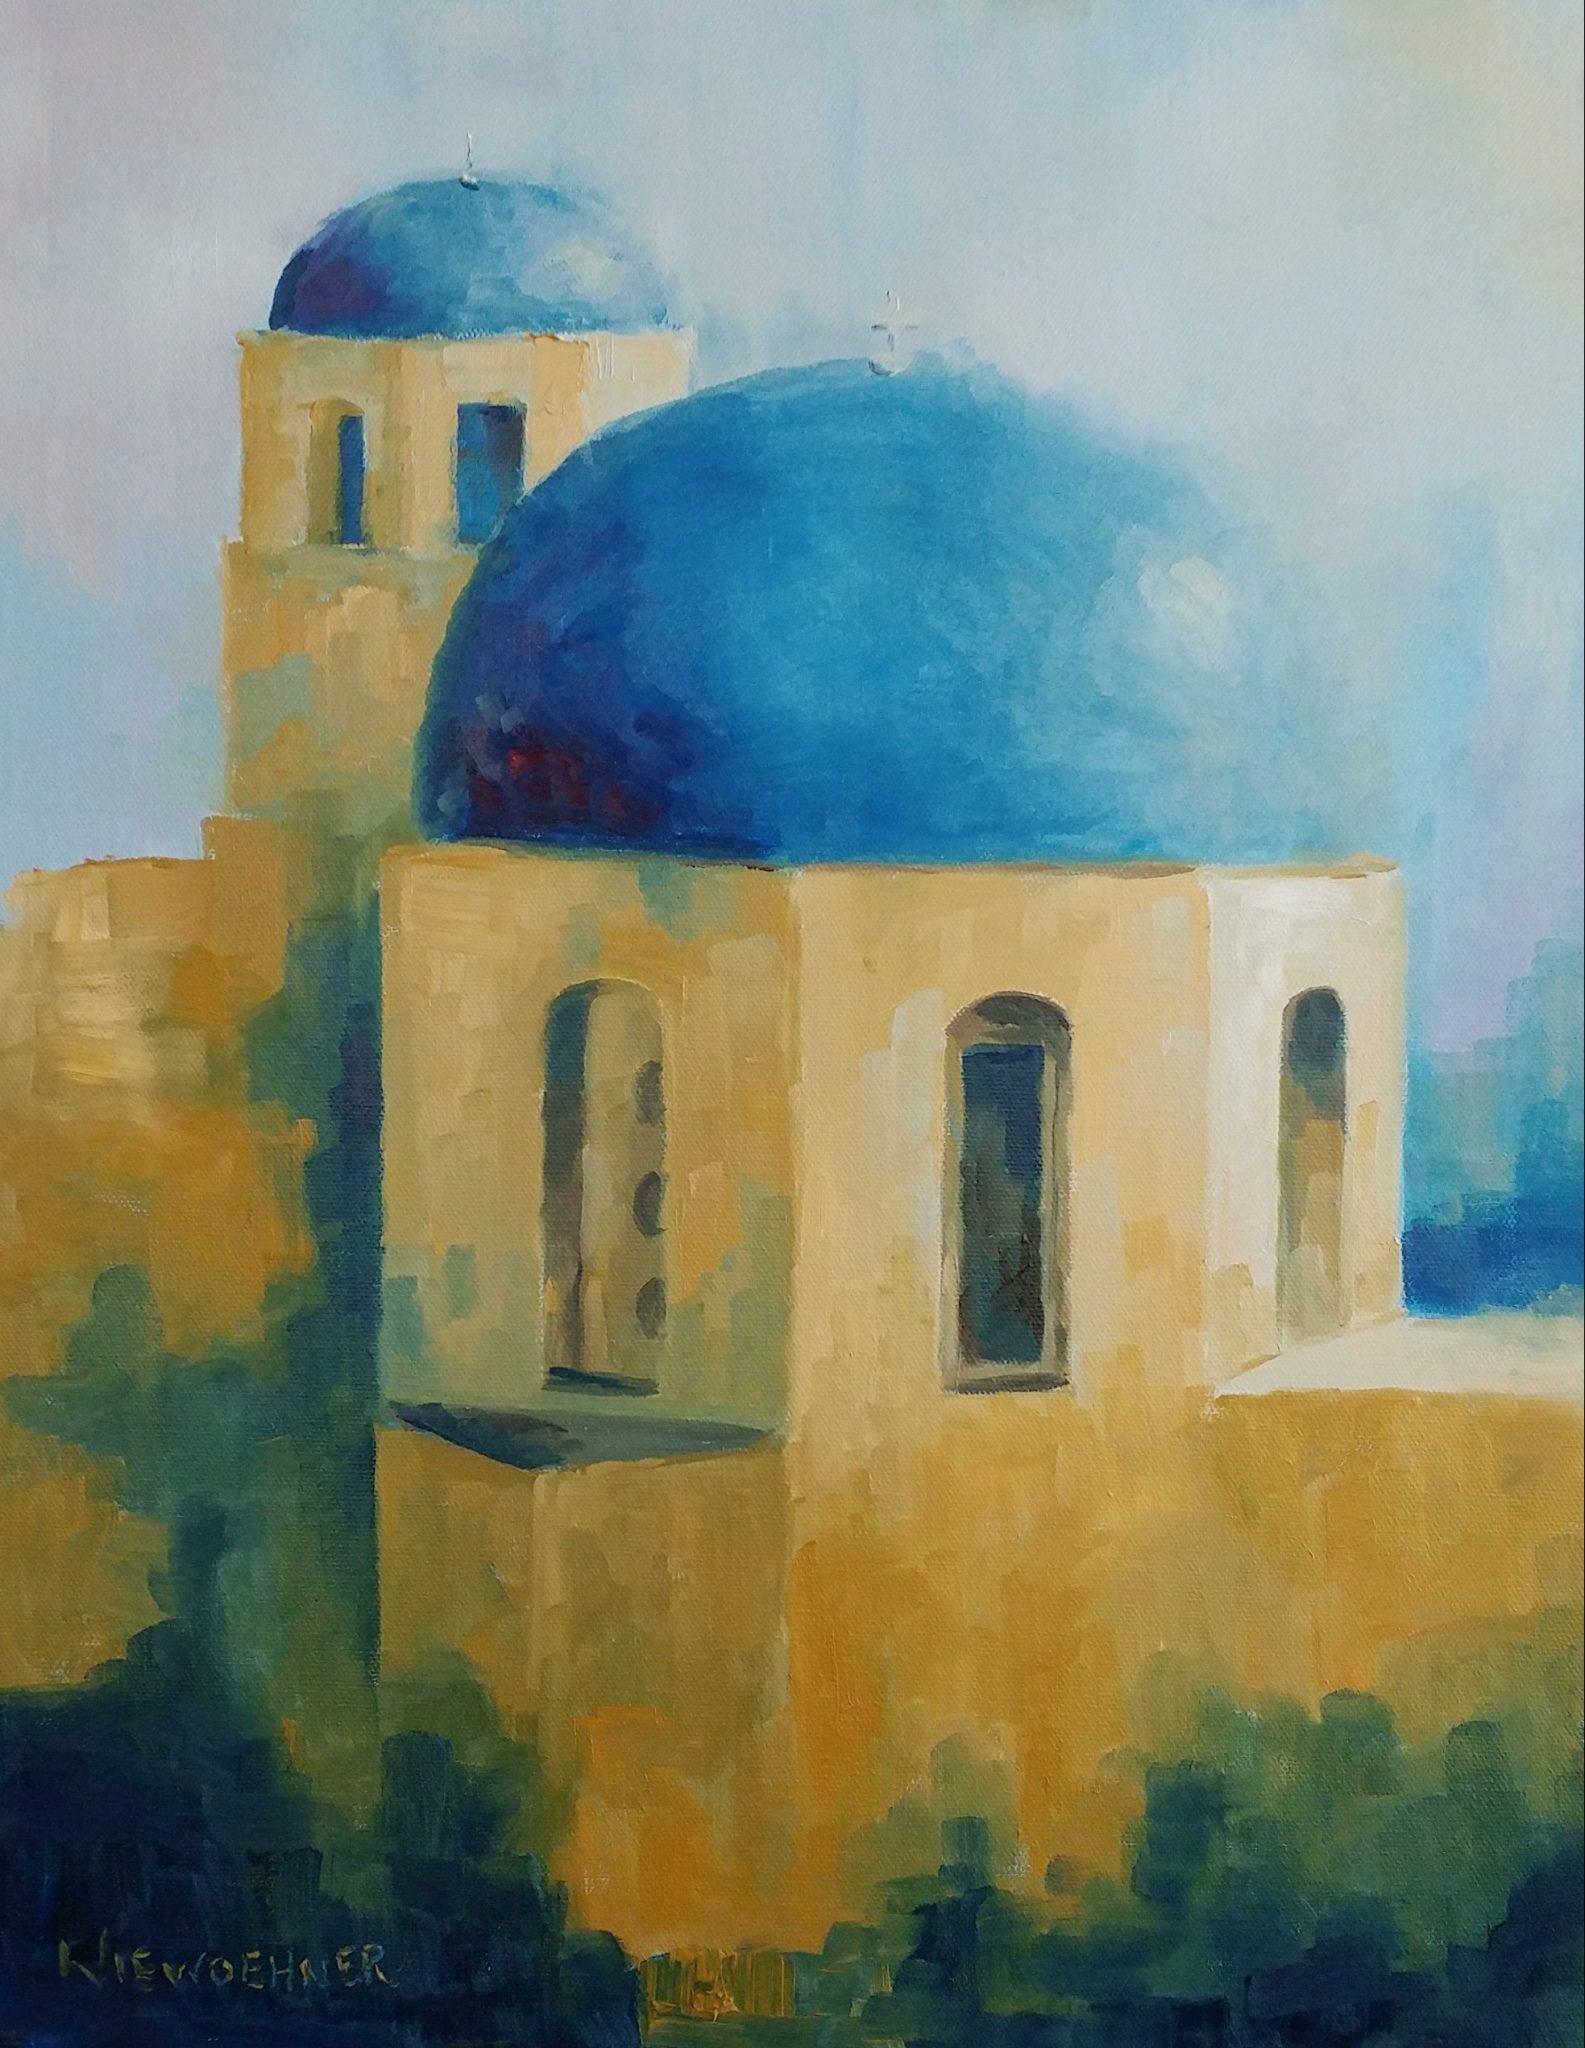 Santorini Revisited Ev Niewoehner January 2019 Exhibition